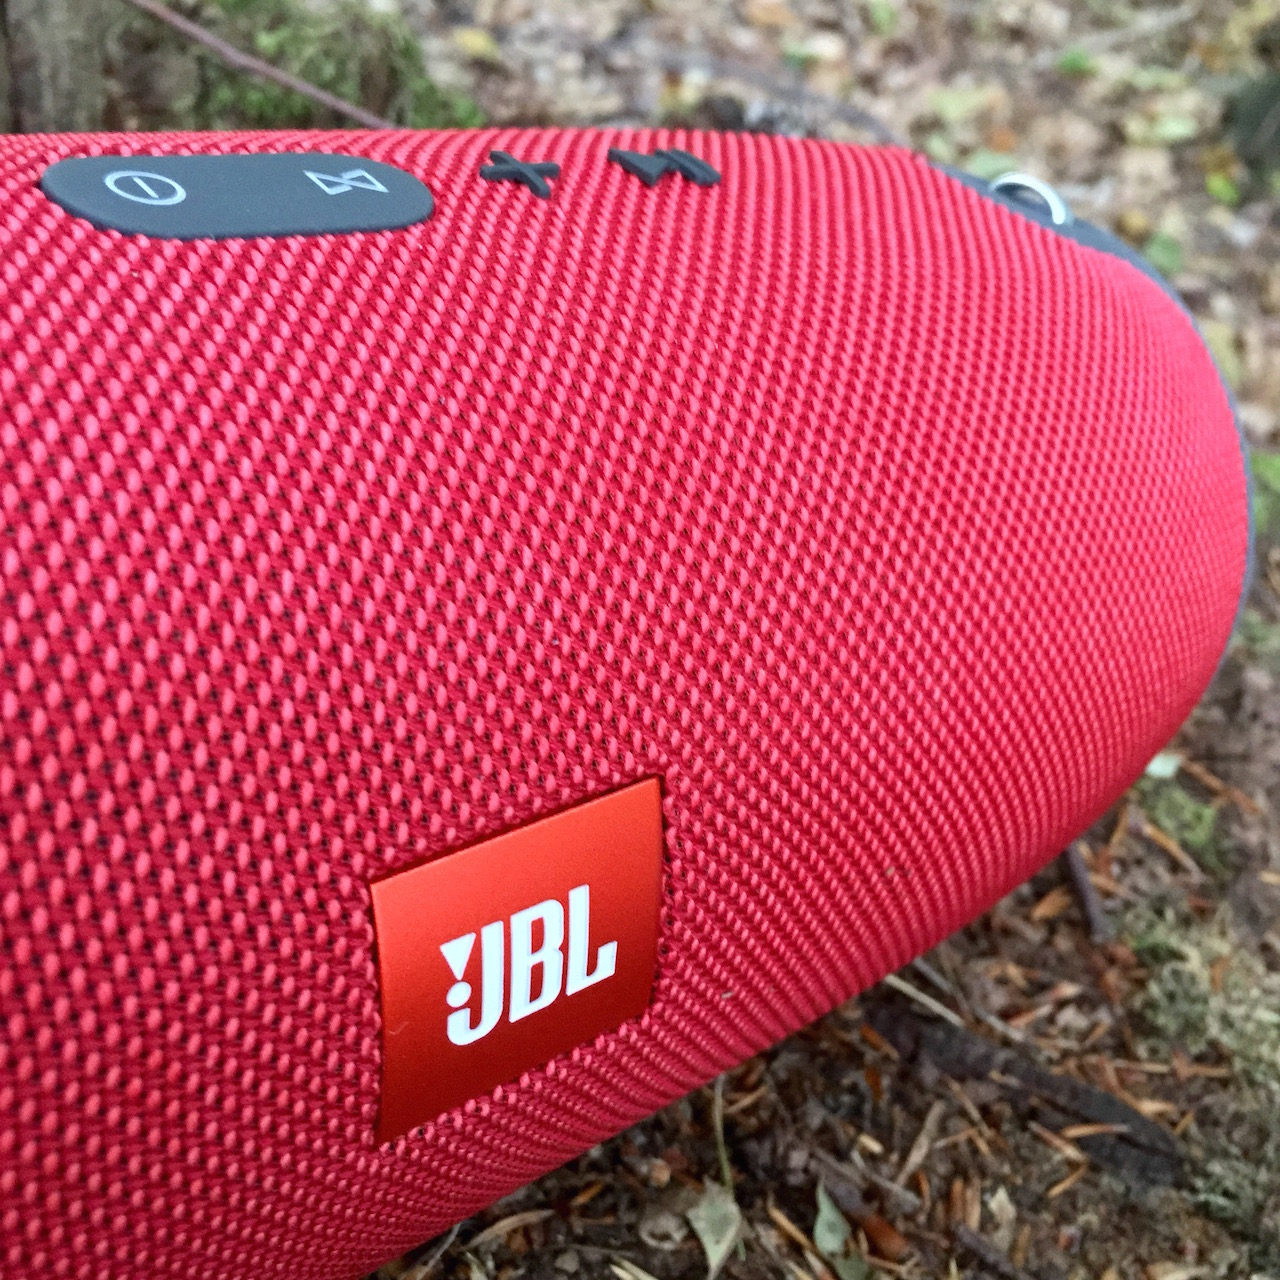 Testbericht Jbl Xtreme Portabler Bluetooth Lautsprecher